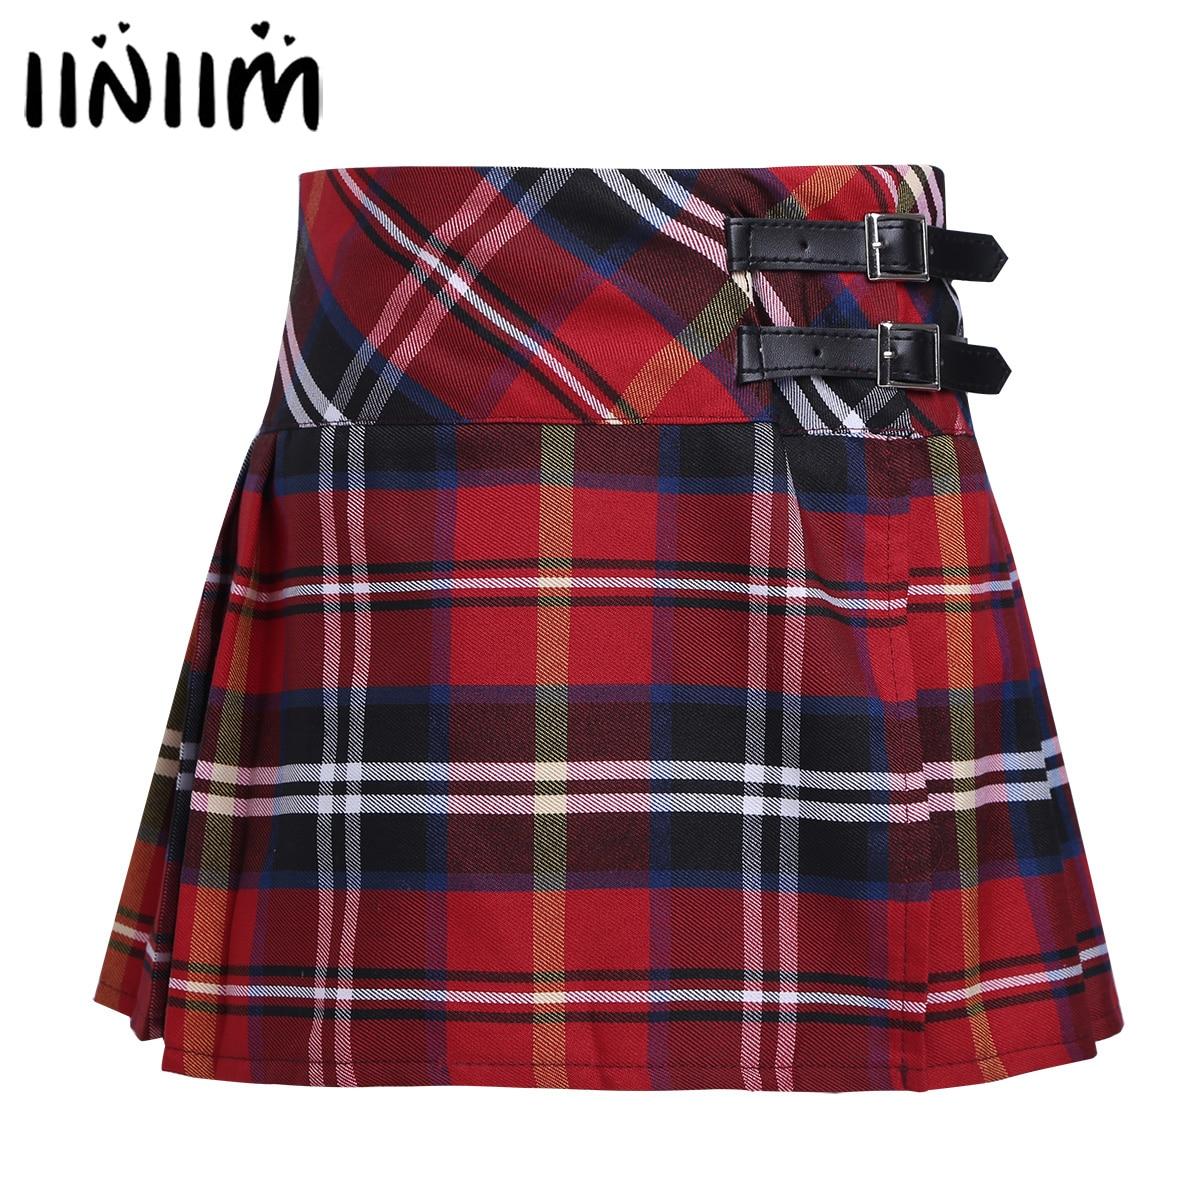 Red Kilt Mini Skirt Stretchy Ladies Sissy Hot Summer Jersey High Waist Girls